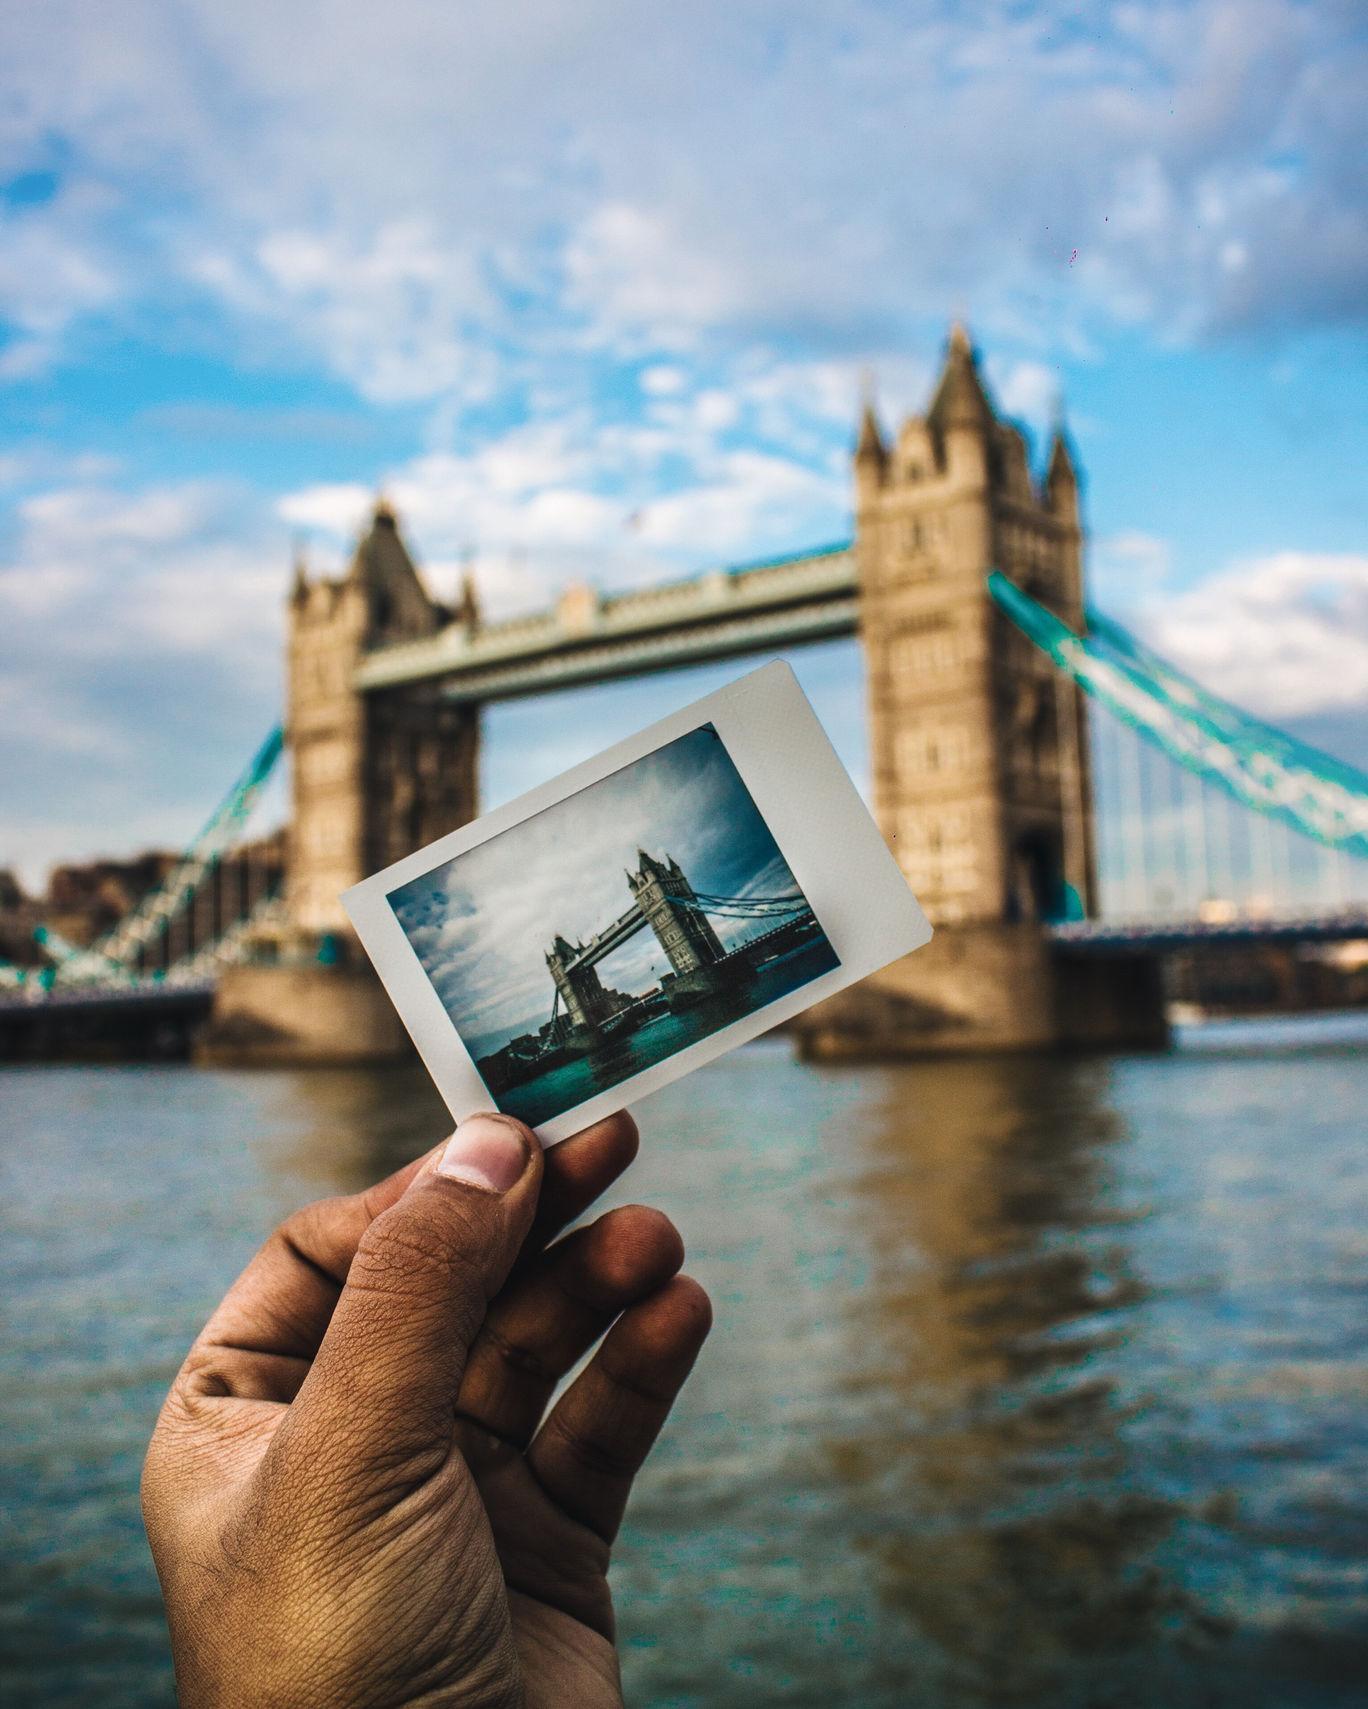 Photo of Tower Bridge By Shobhit Khatter